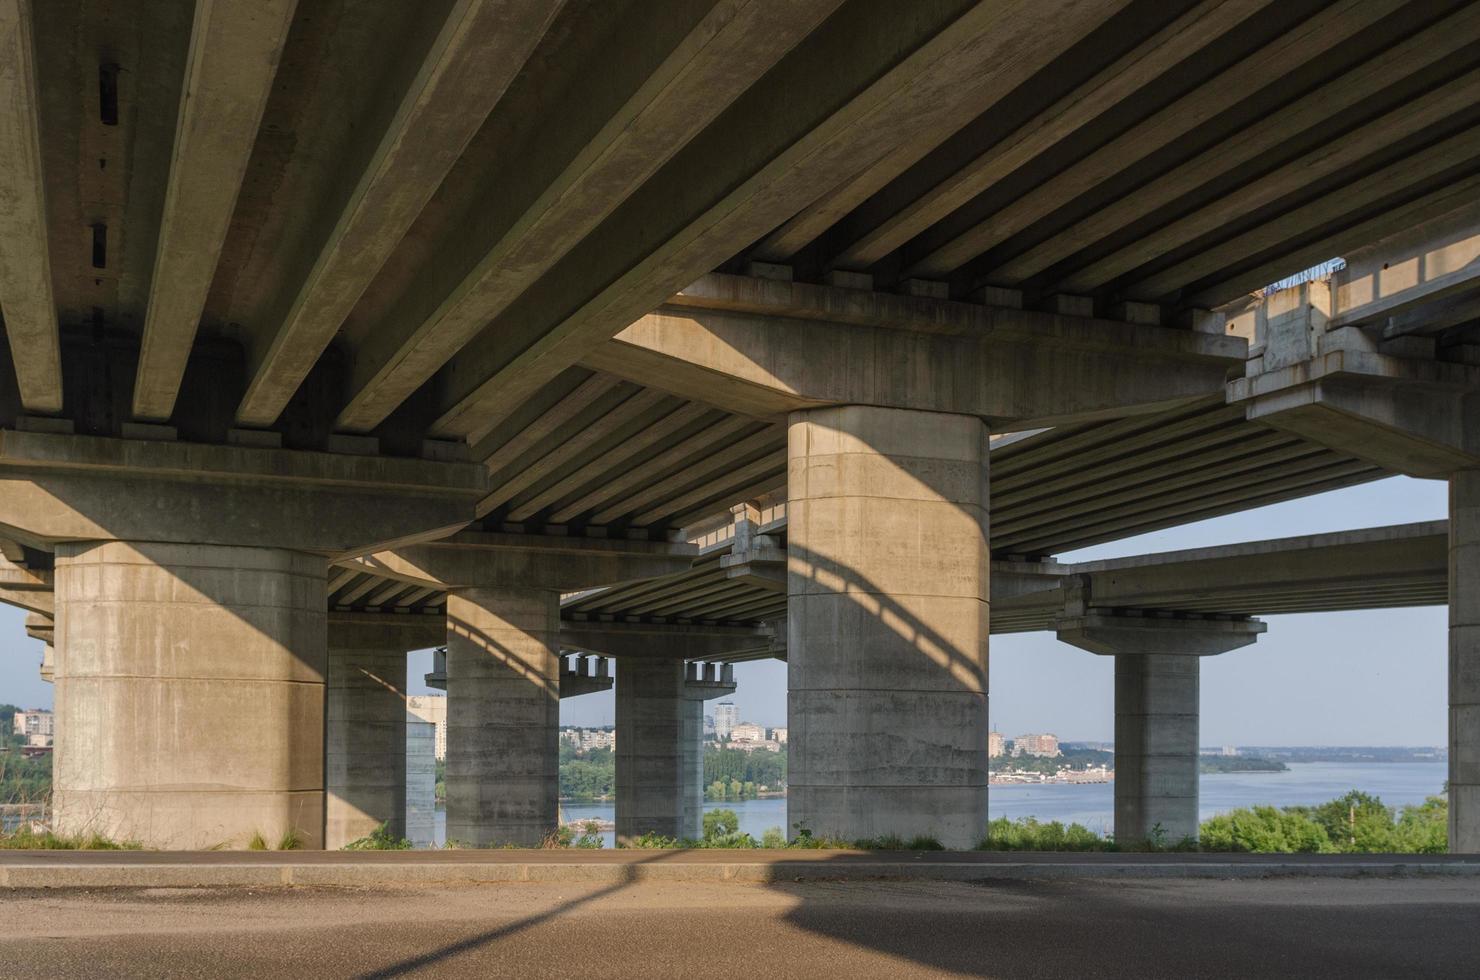 Brücke im Bau mit Straße foto